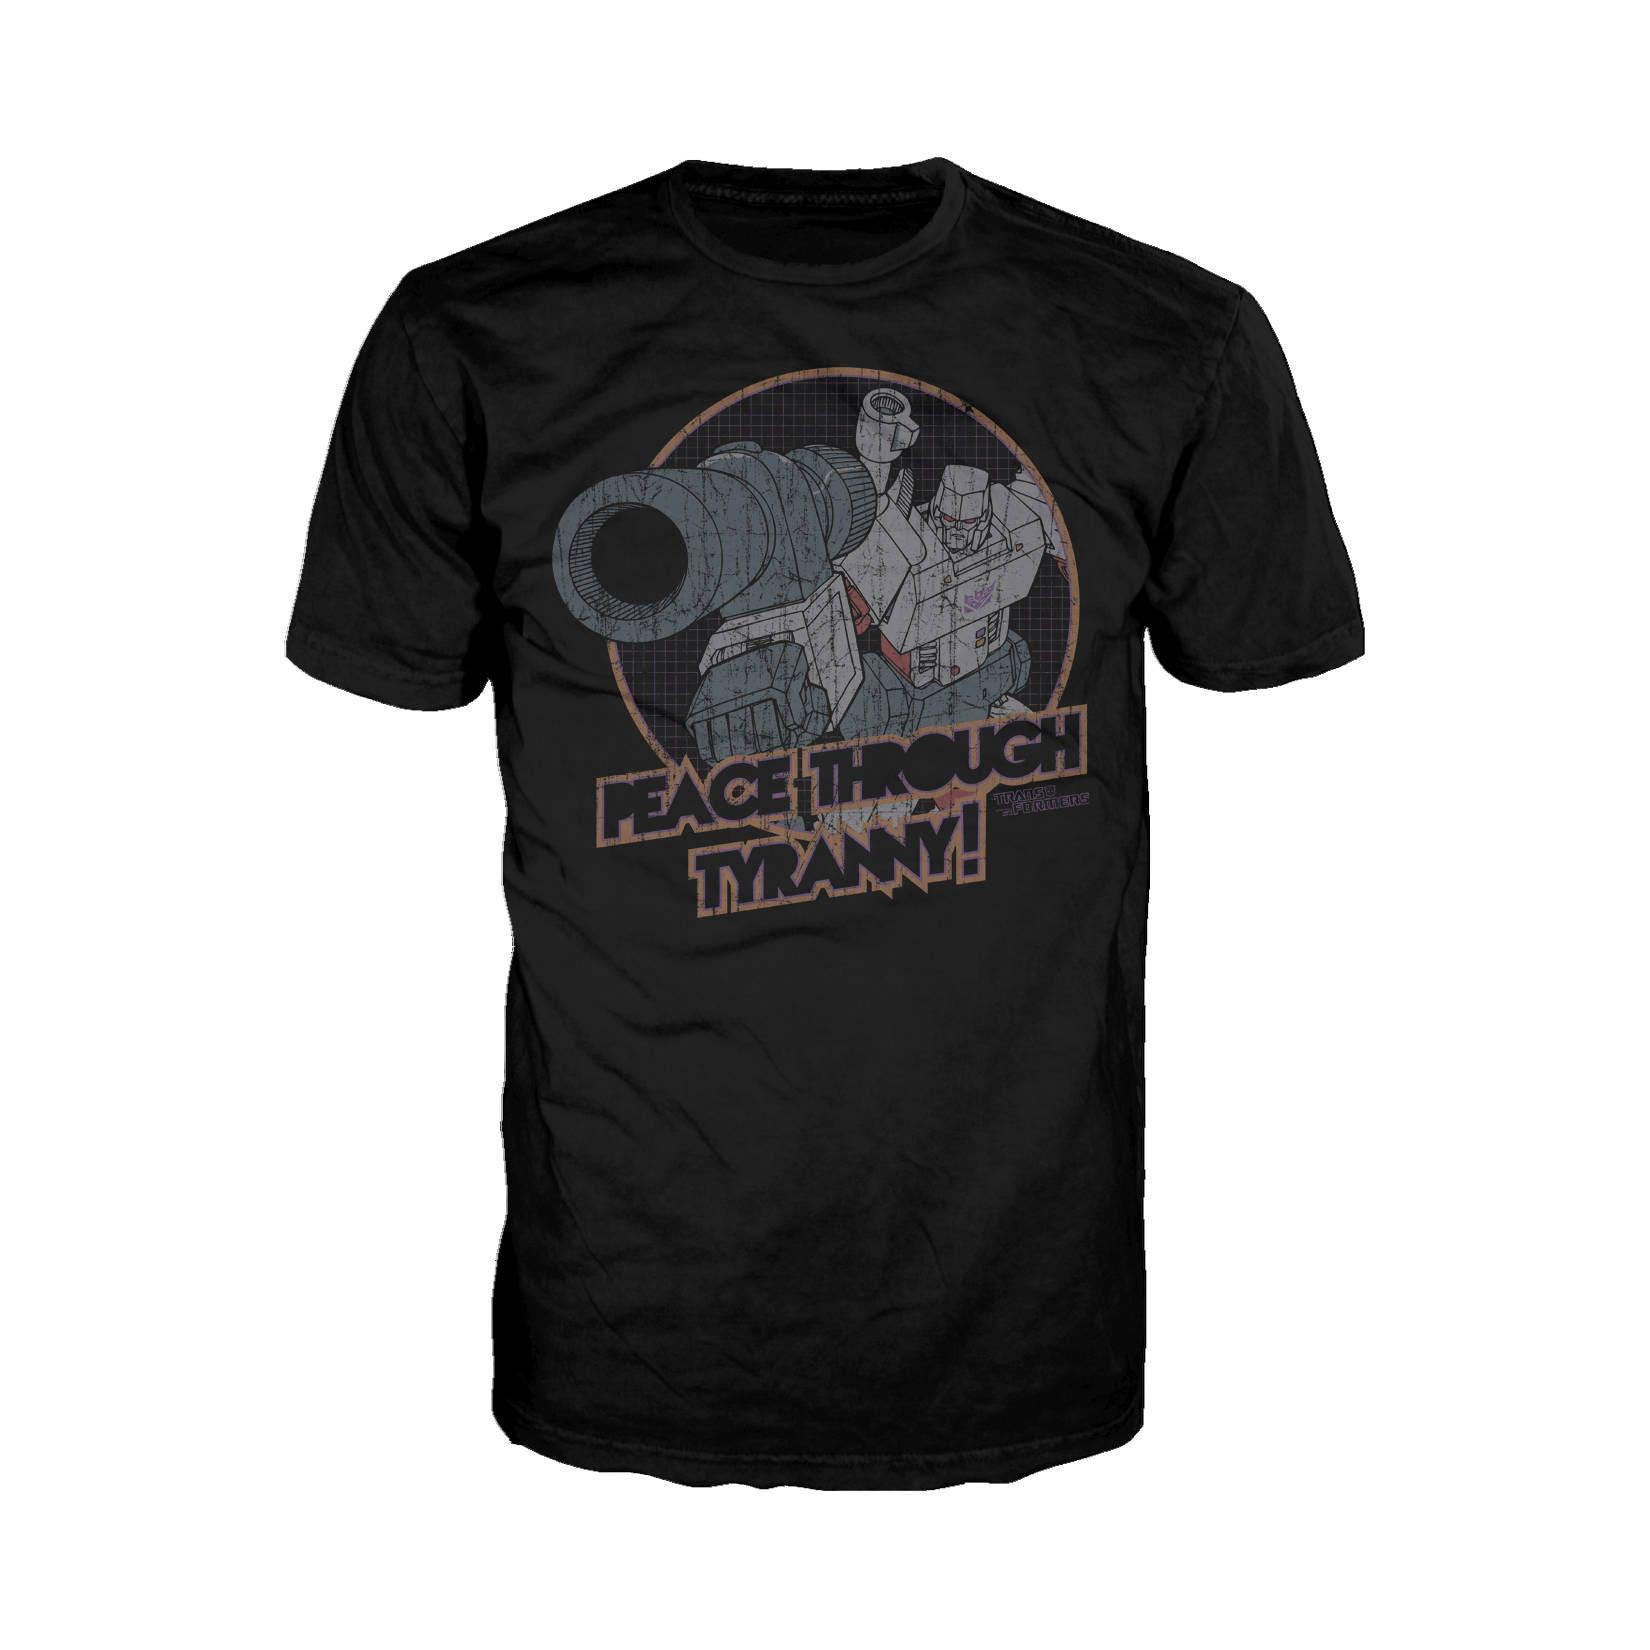 Transformers Megatron Tyranny Official Hasbro Mens Tshirt (Black)